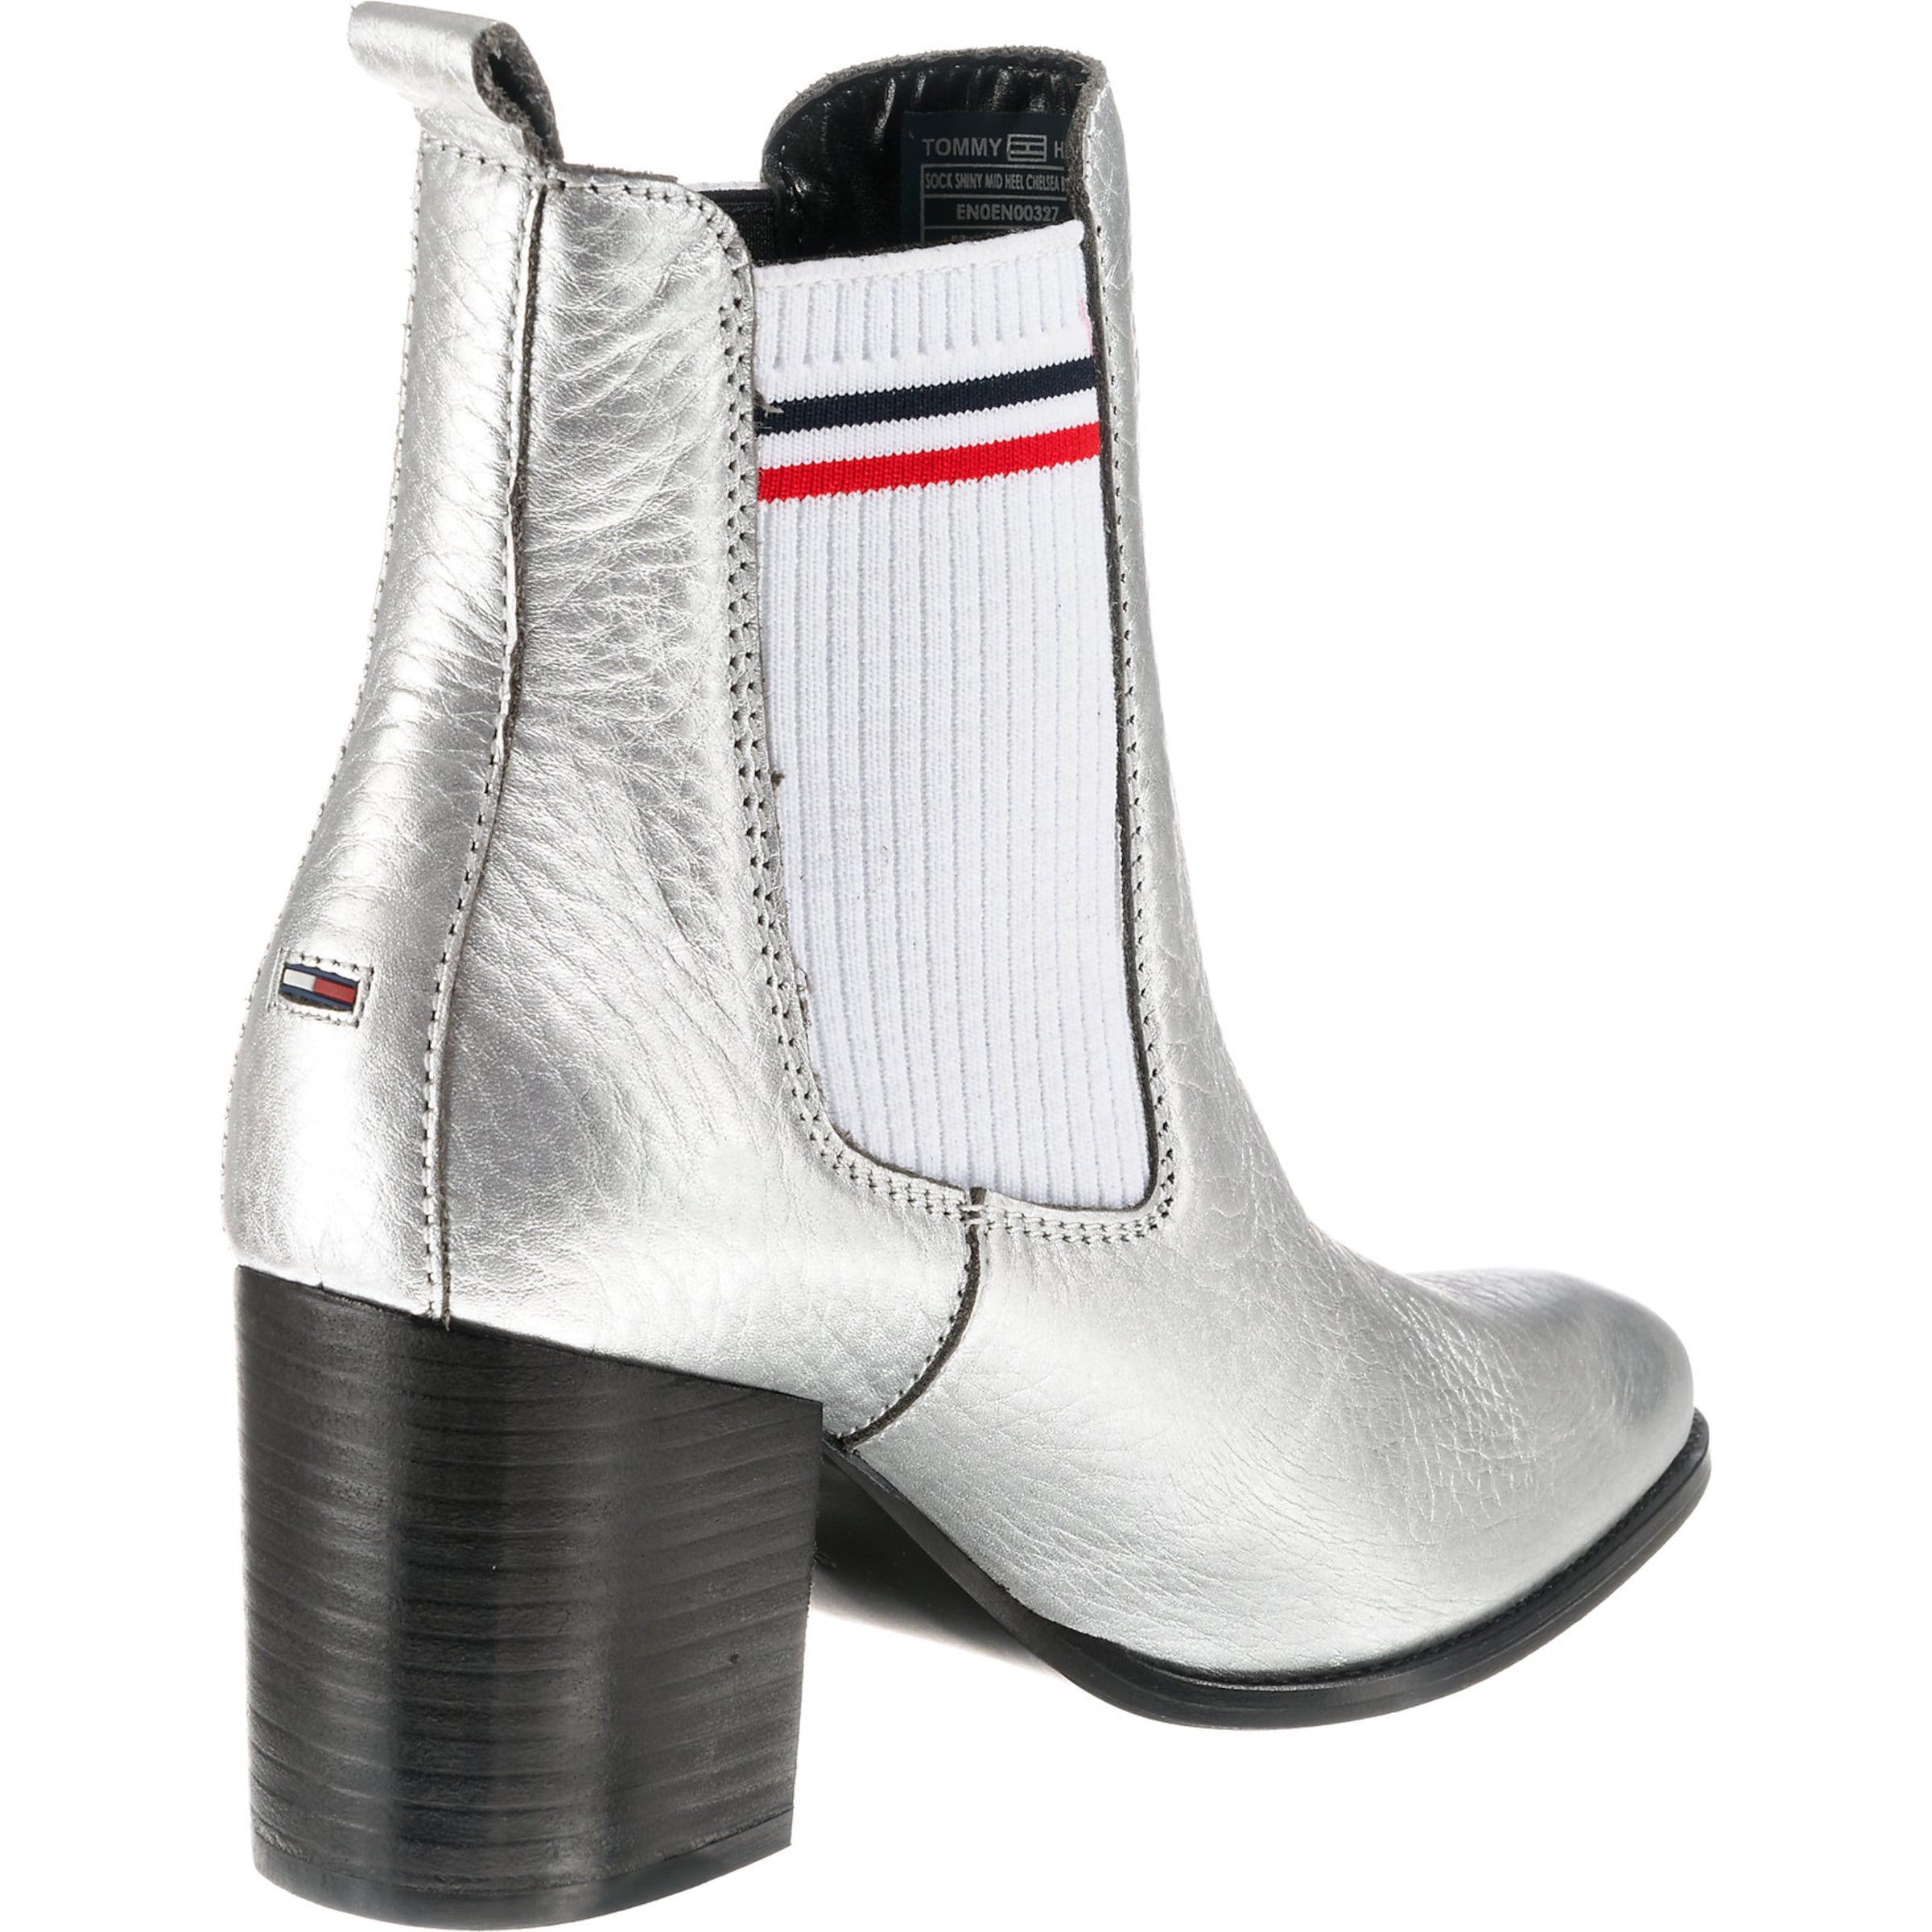 Shiny Mid Heel' Tommy In Weiß Boot 'sock Silber NavyRot Jeans SzMVLUqjGp